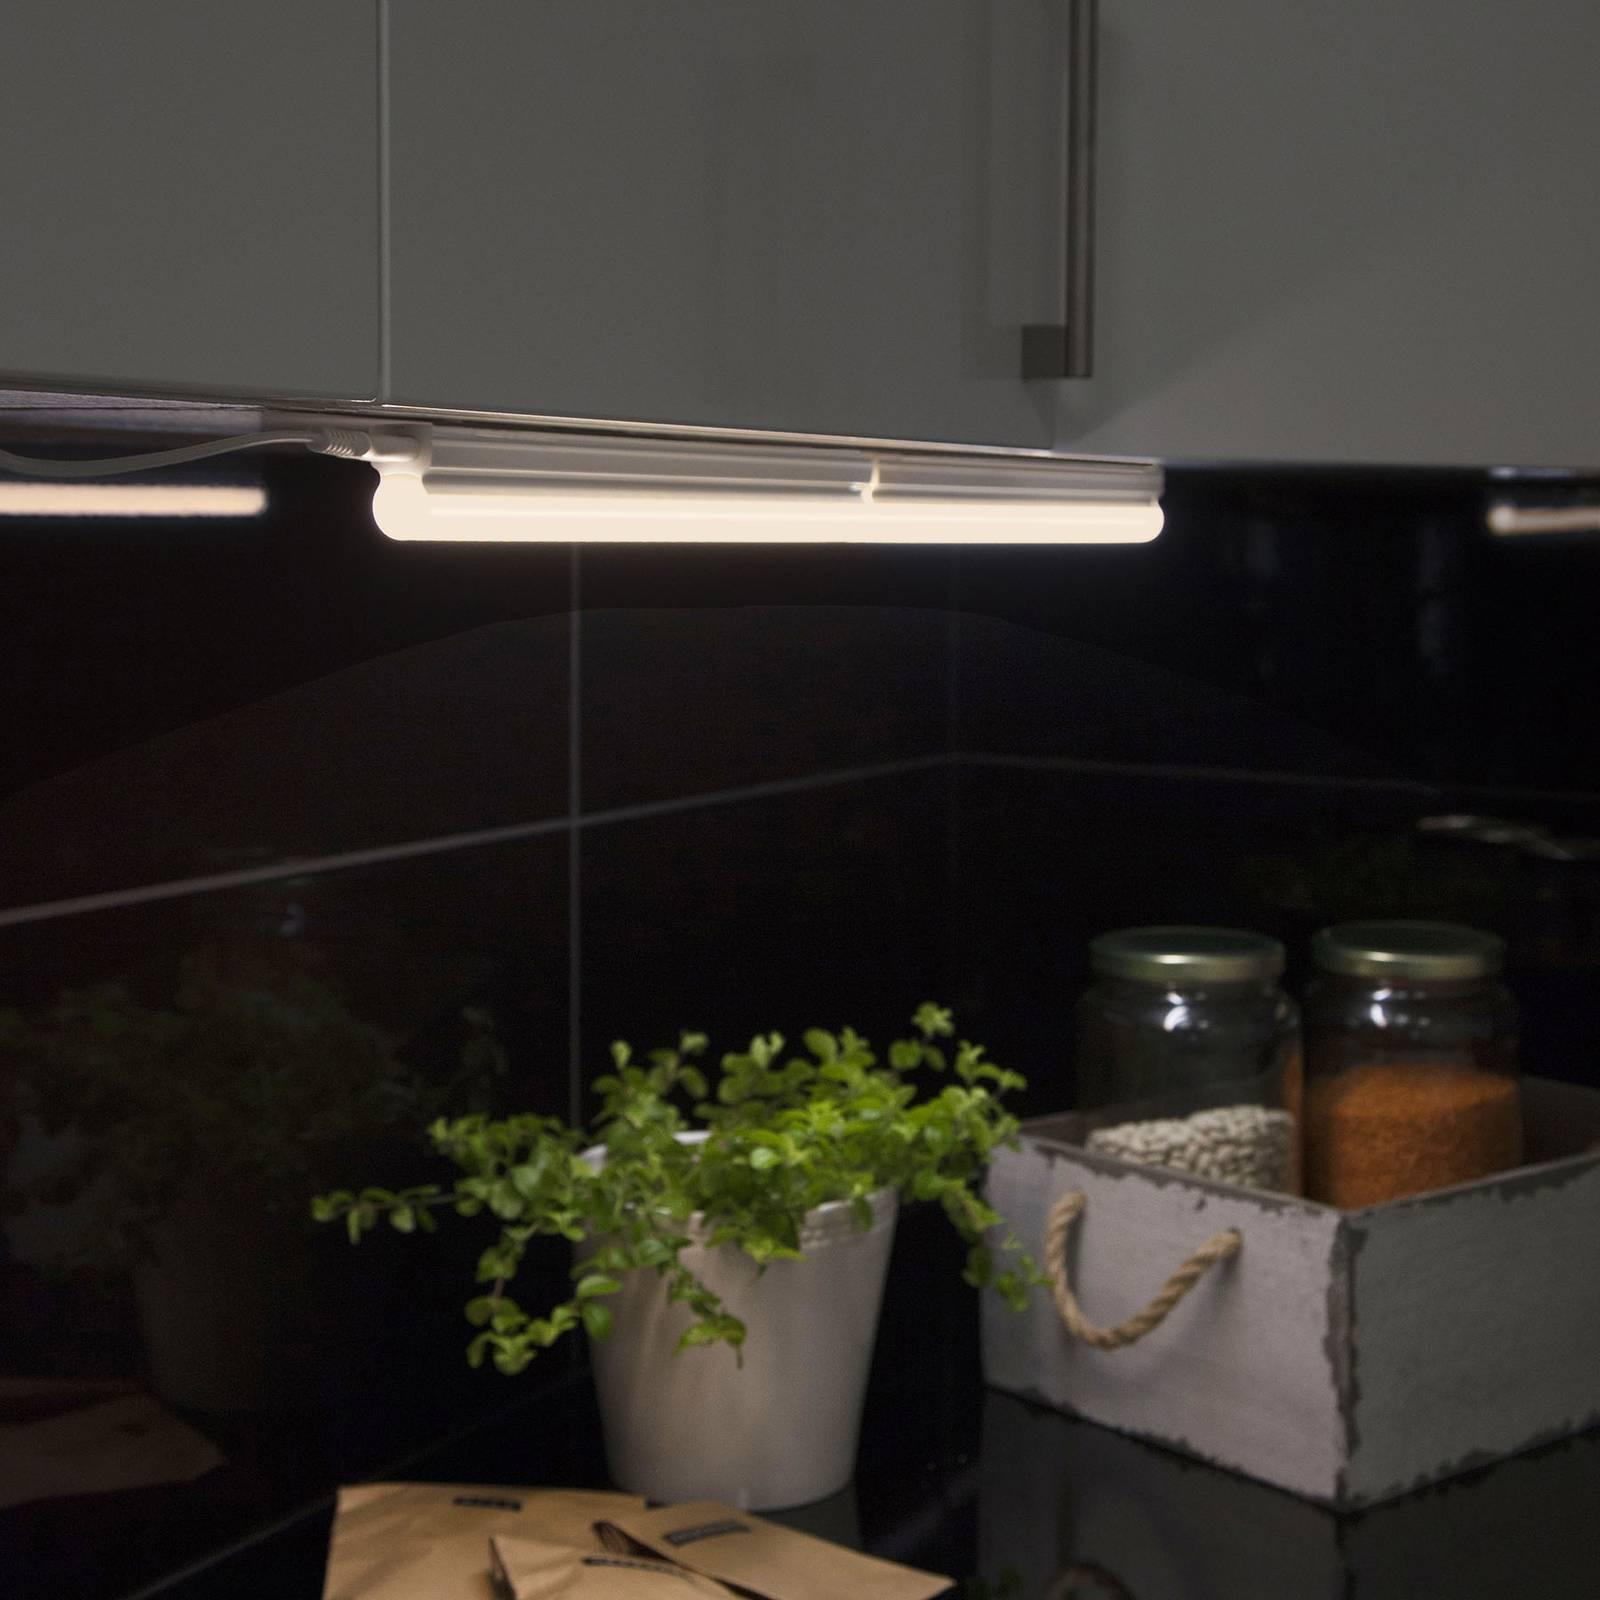 LED-kaapinalusvalaisin Cabinet Light 31 cm 3 000 K